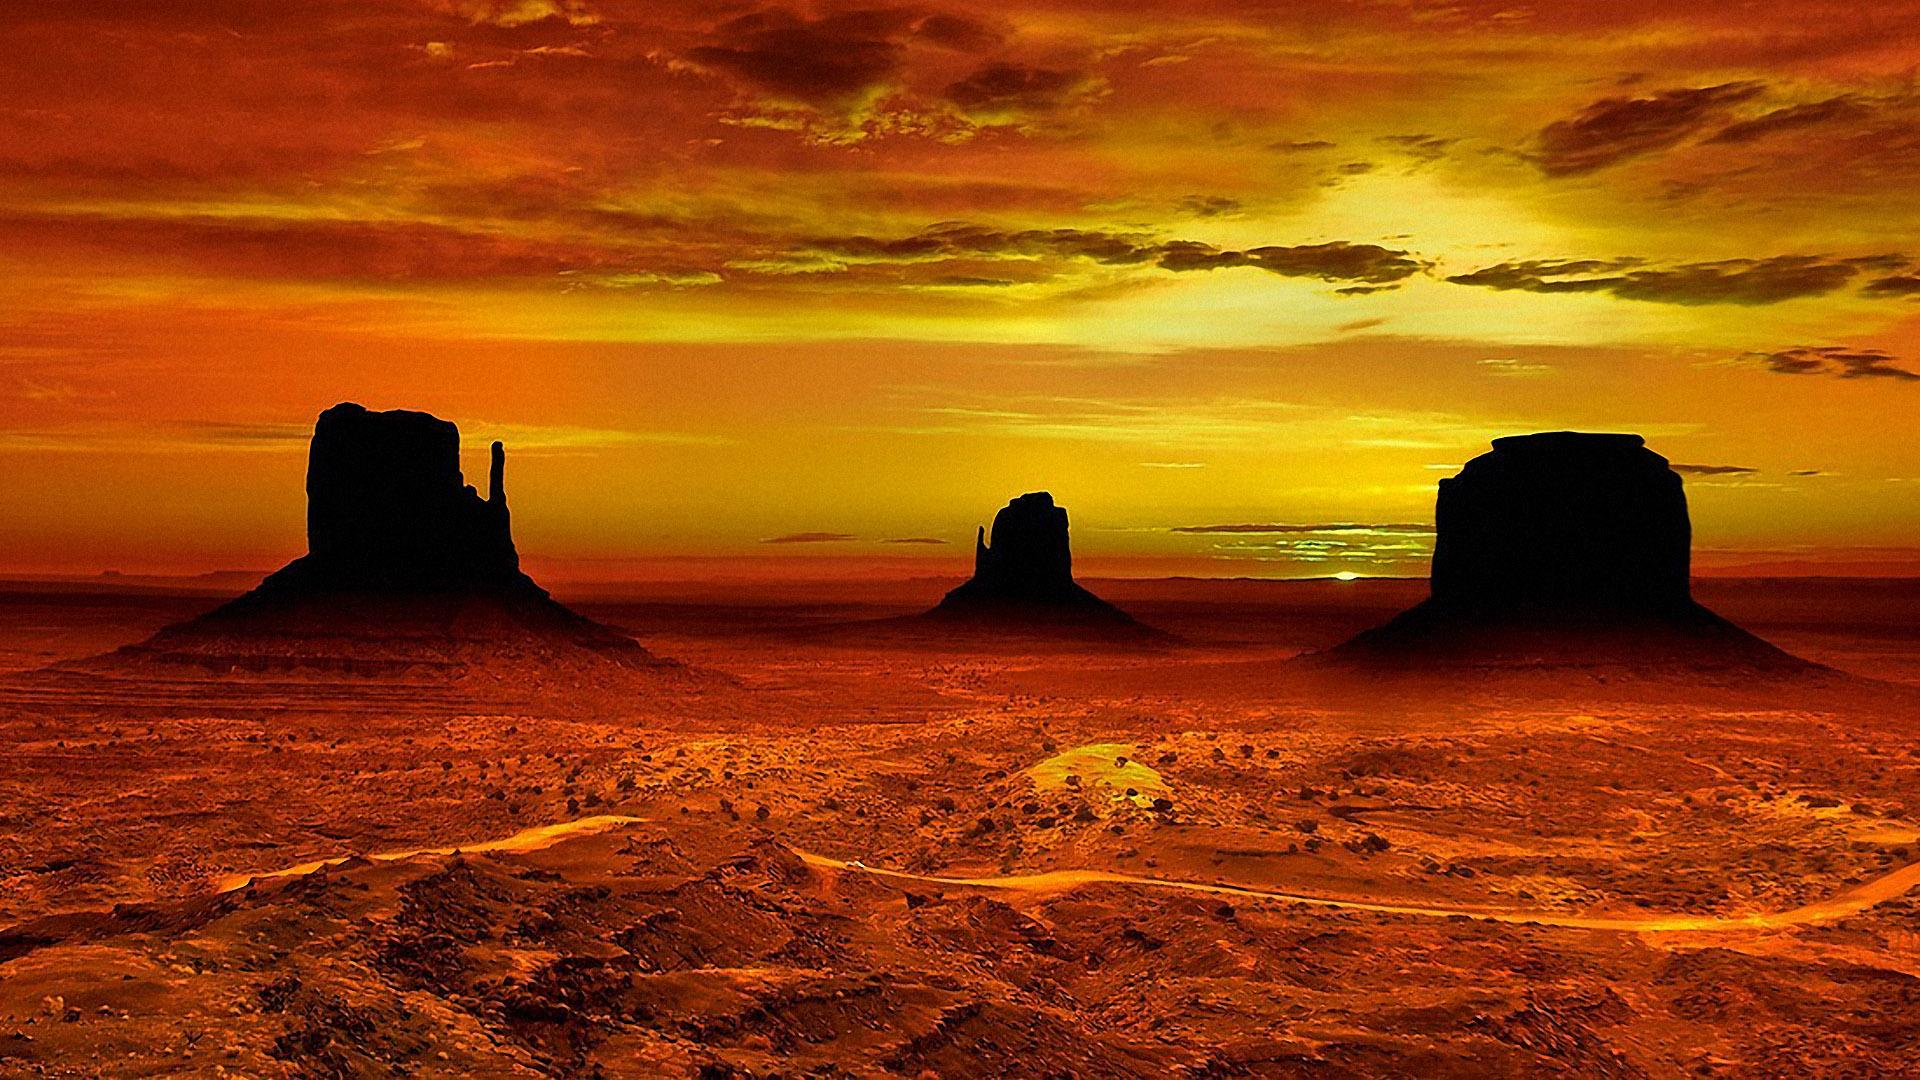 wallpaper sunset mountain arizona - photo #44